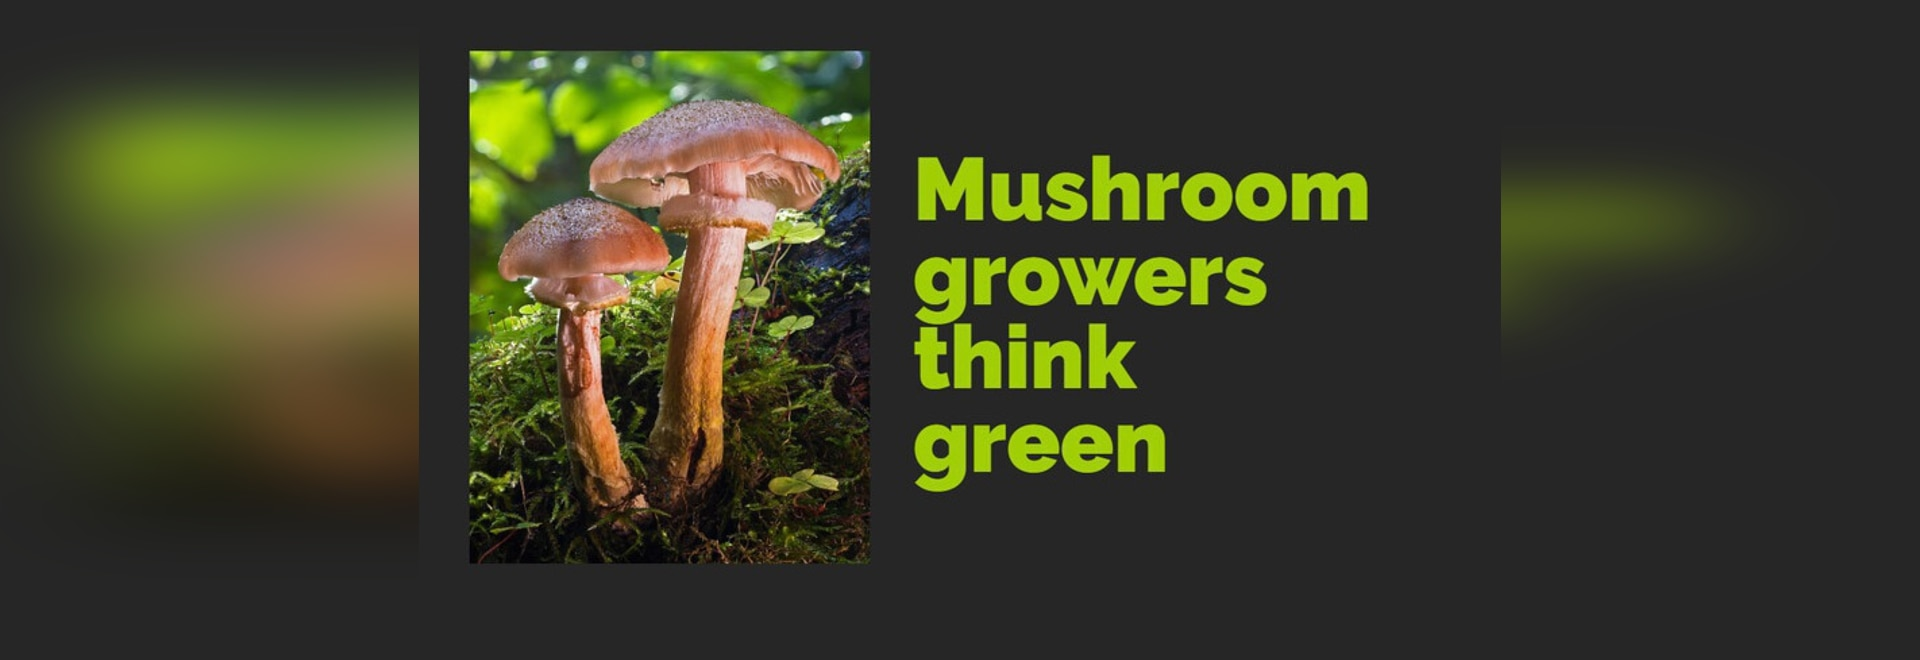 Organic mushroom growers are thinking green